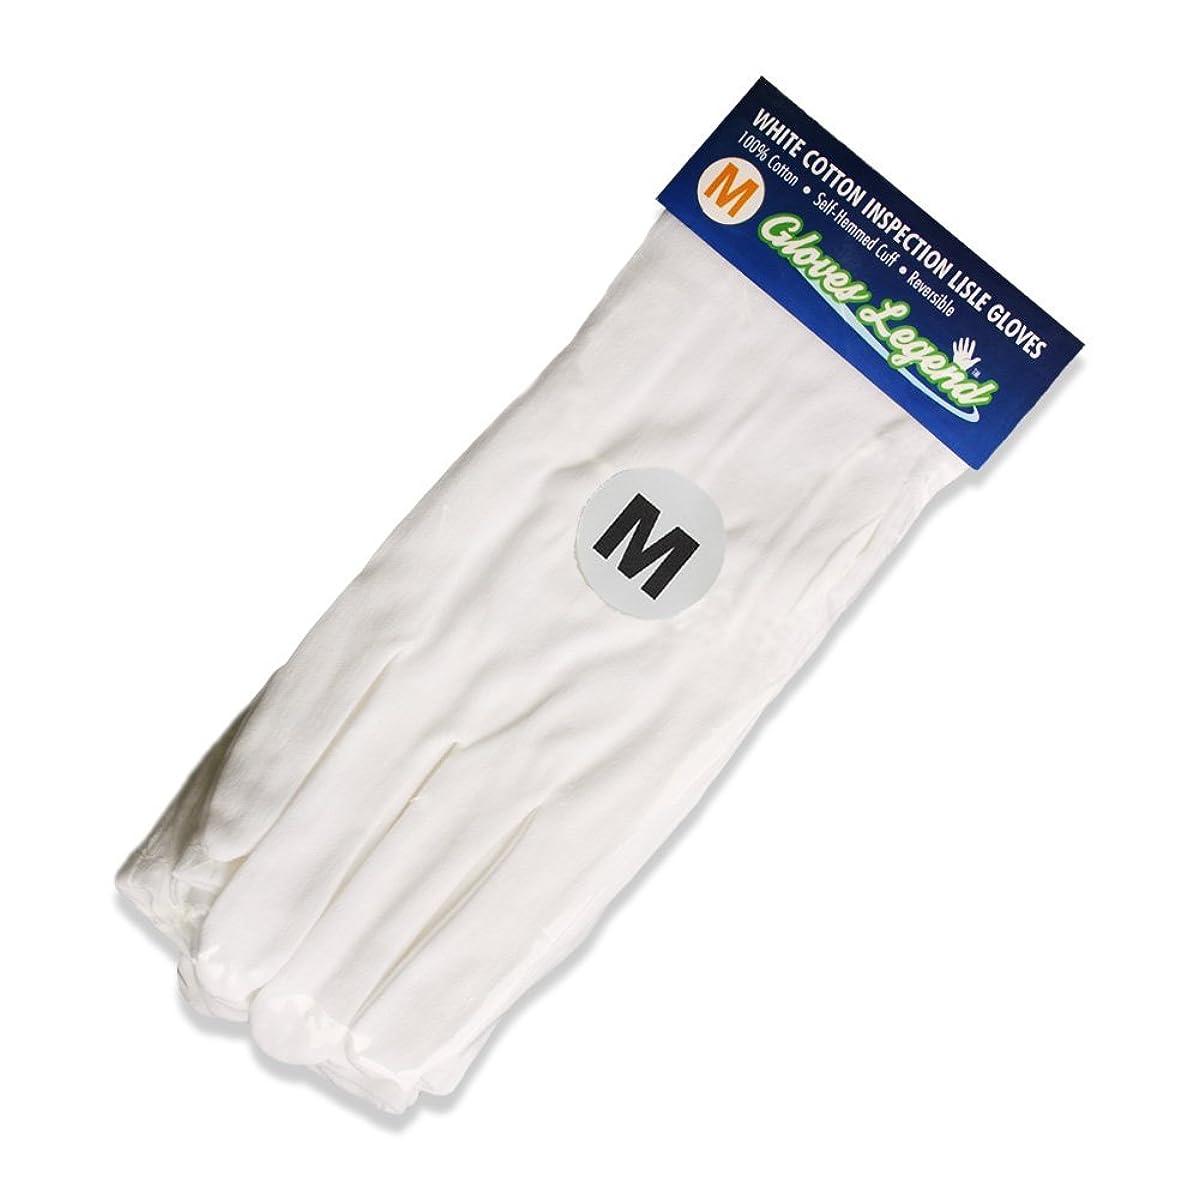 Size Medium - 6 Pairs (12 Gloves) Gloves Legend White Coin Jewelry Silver Inspection Cotton Lisle Moisturizing Gloves - Medium Weight